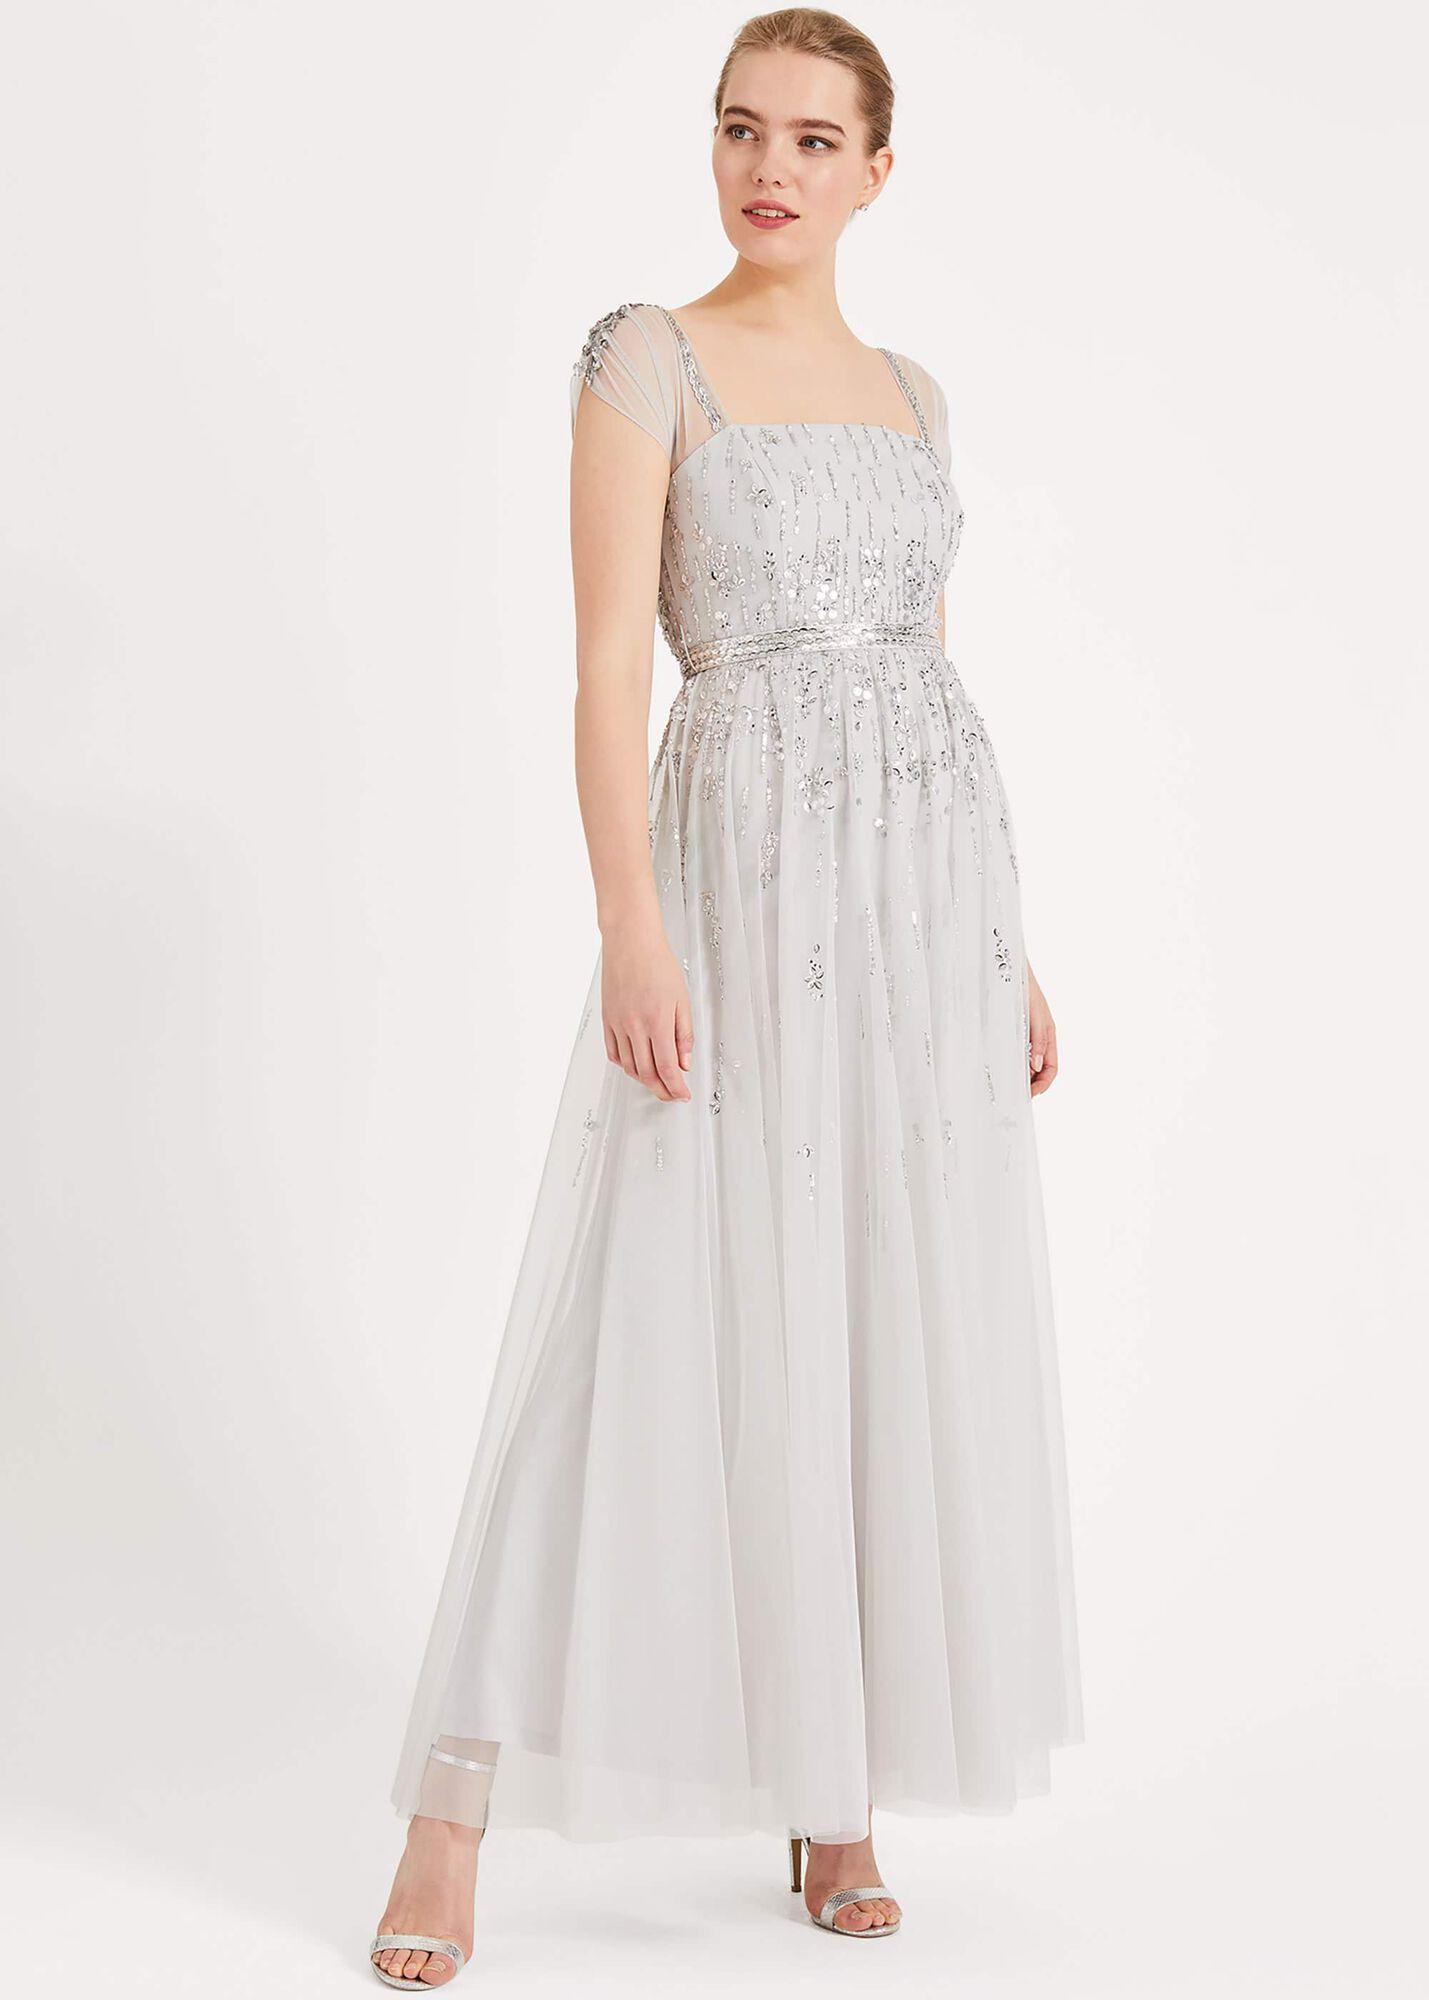 7b9908095c926 Mara Sequin Maxi Dress | Phase Eight | Phase Eight